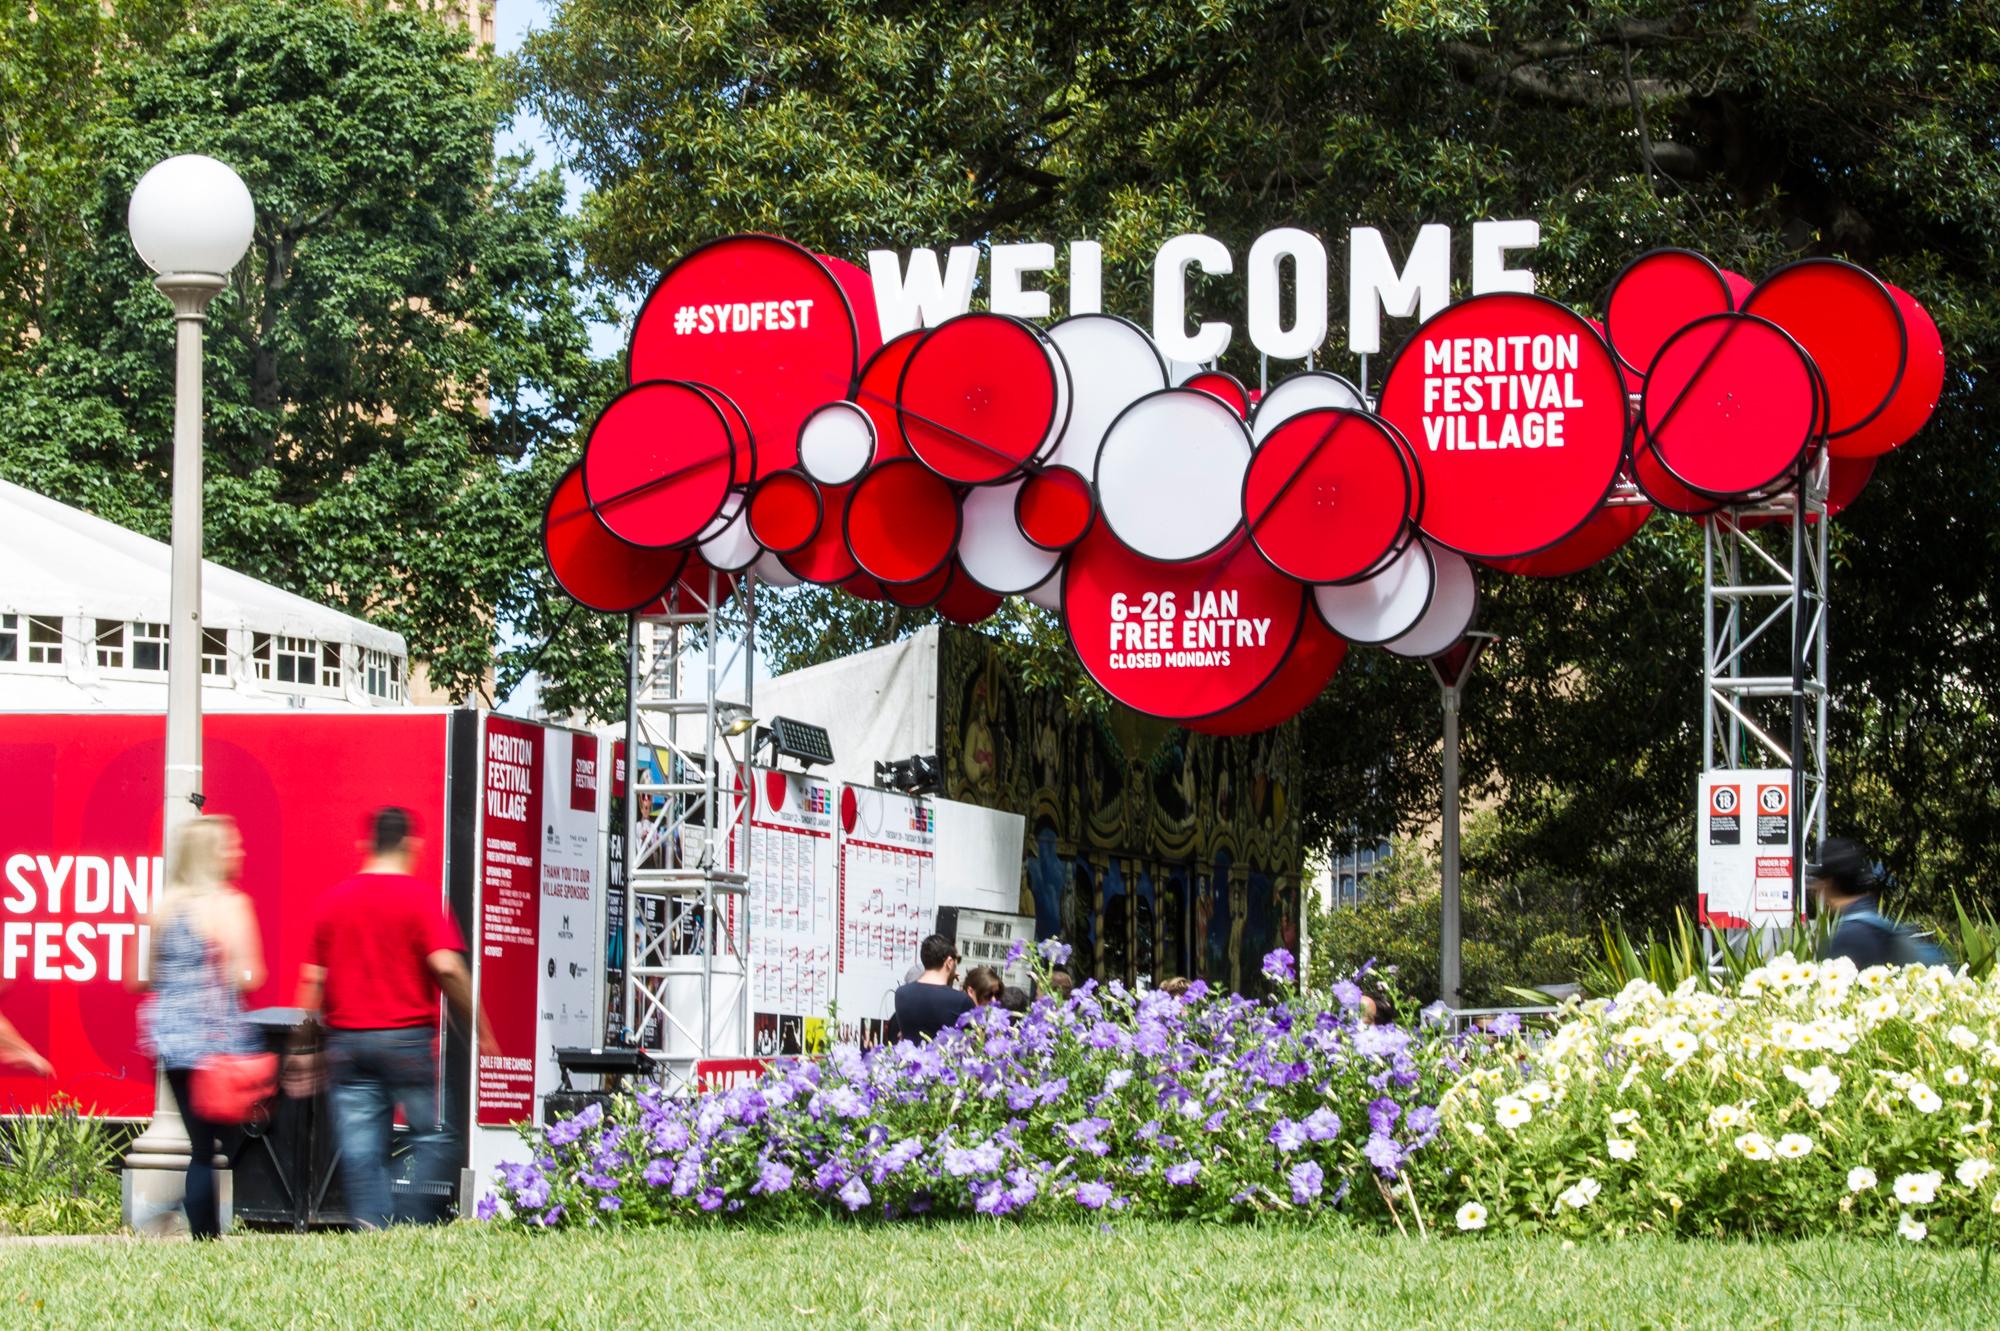 Image courtesy of Sydney Festival. Photo credit: Jamie Williams